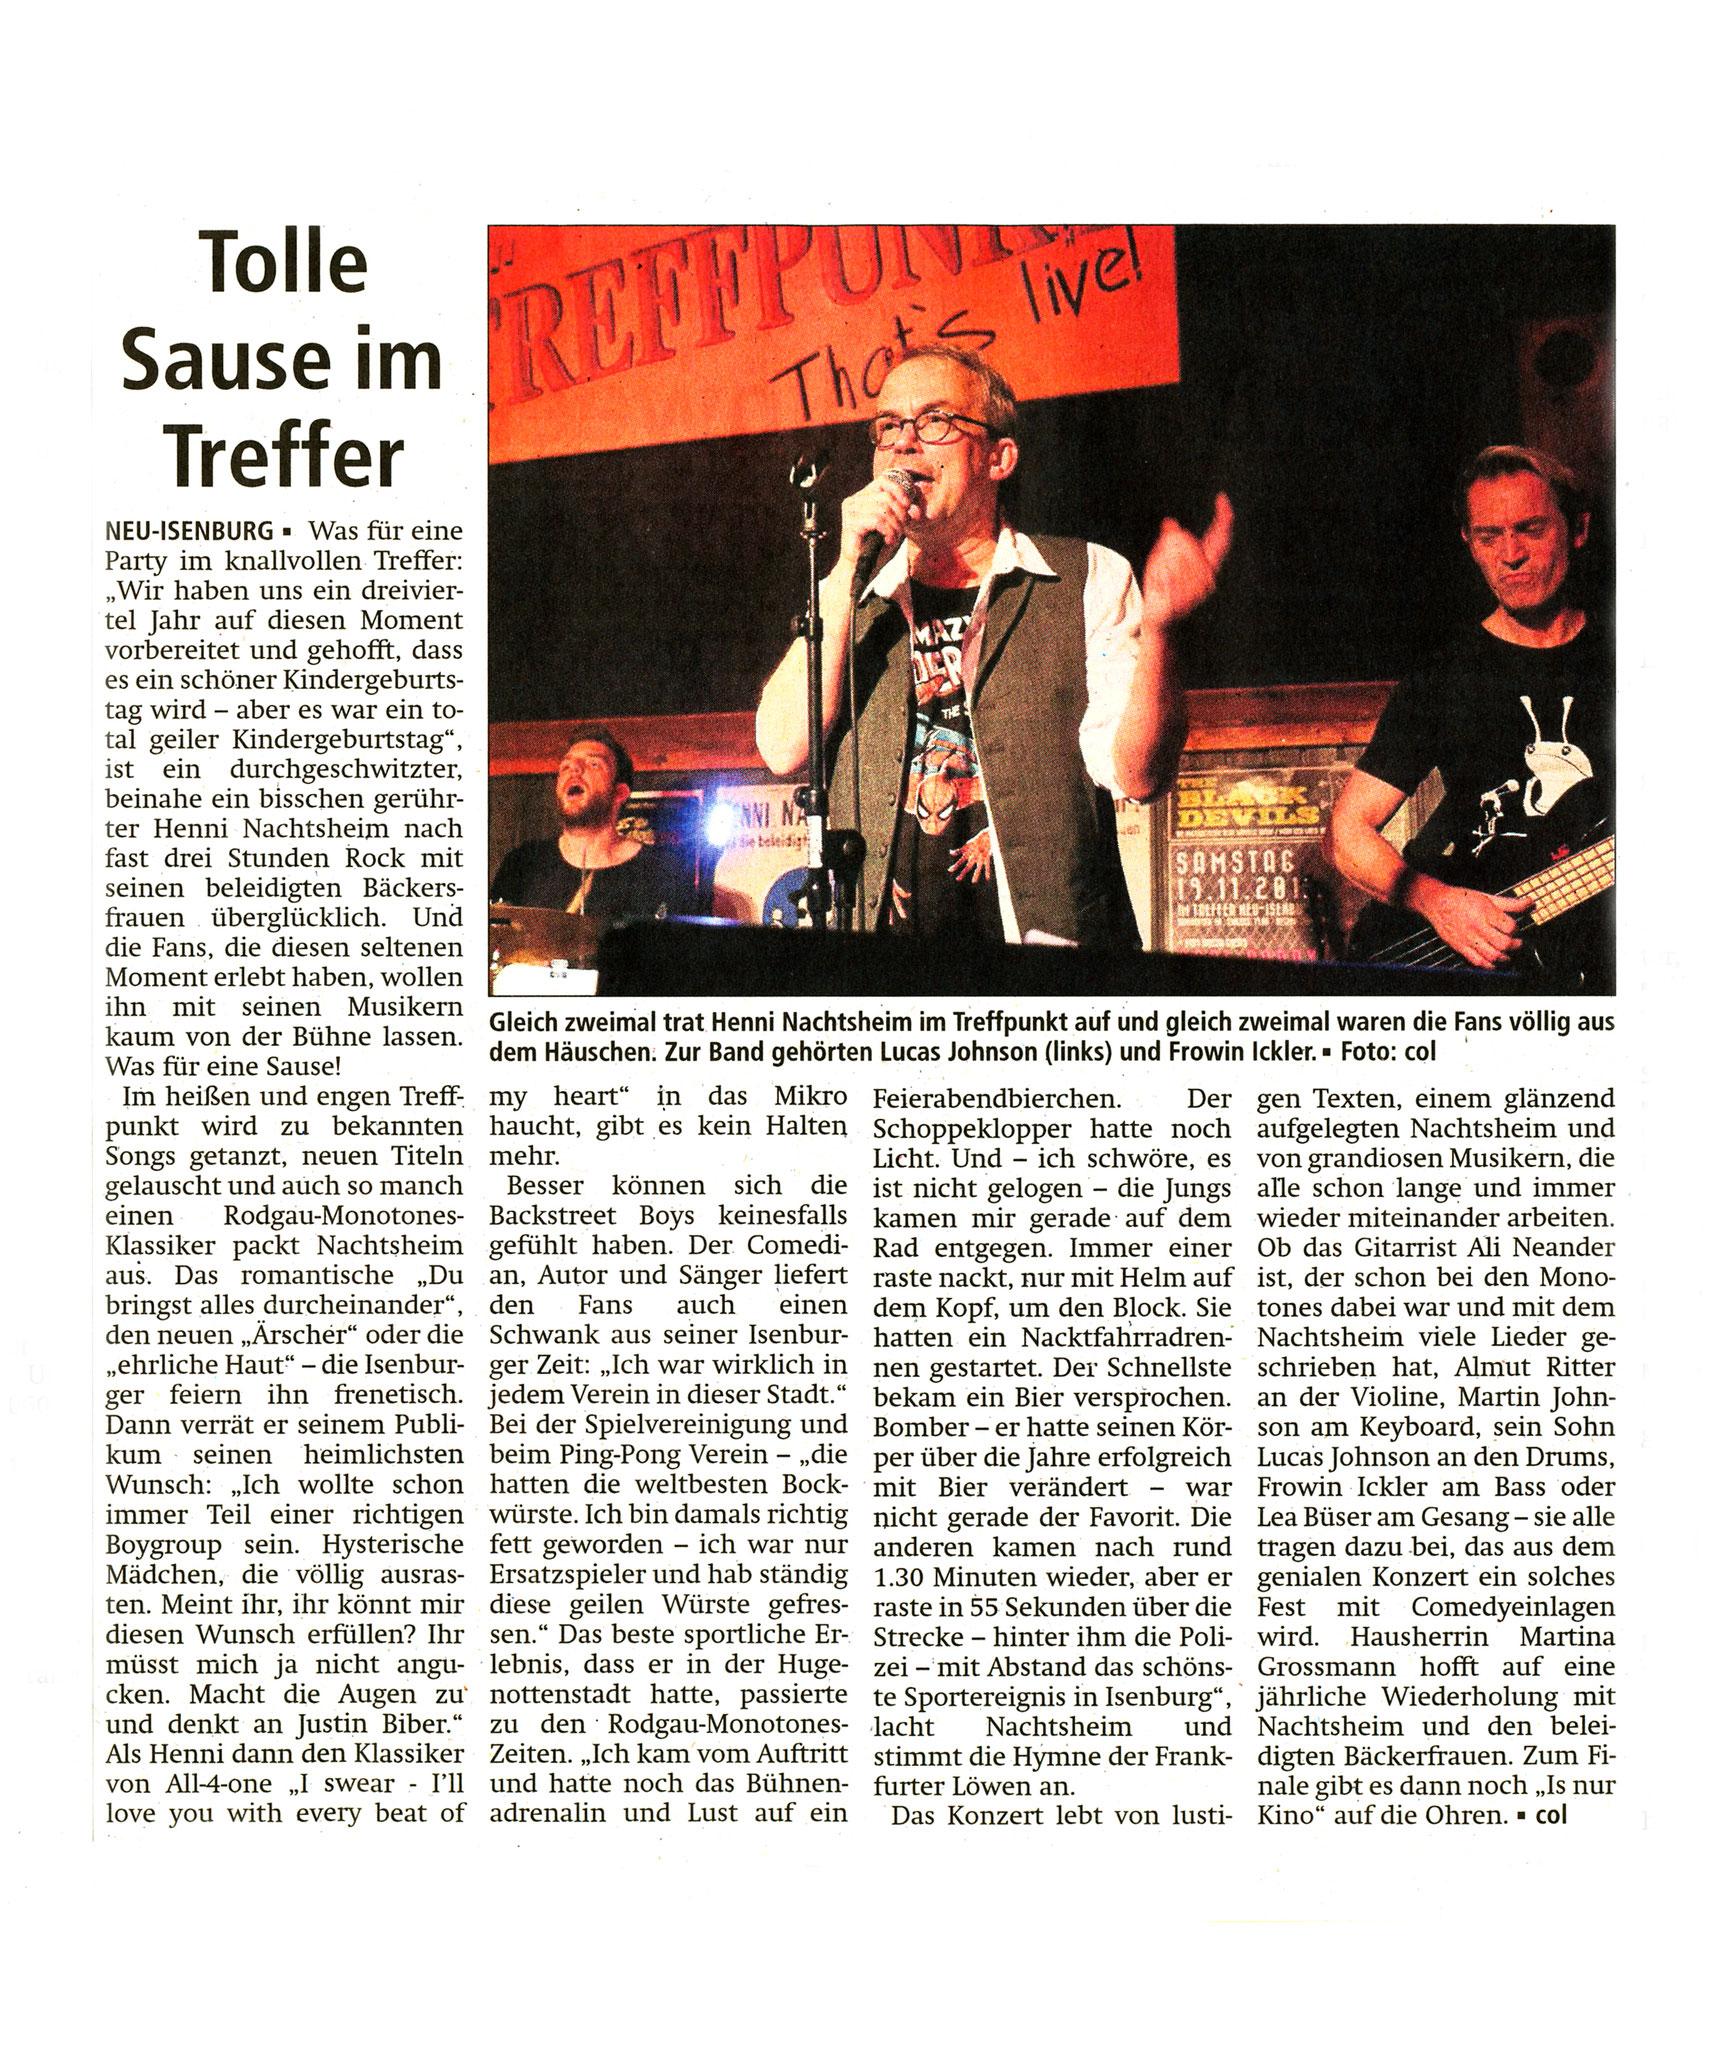 Offenbach Post, 31. Oktober 2016